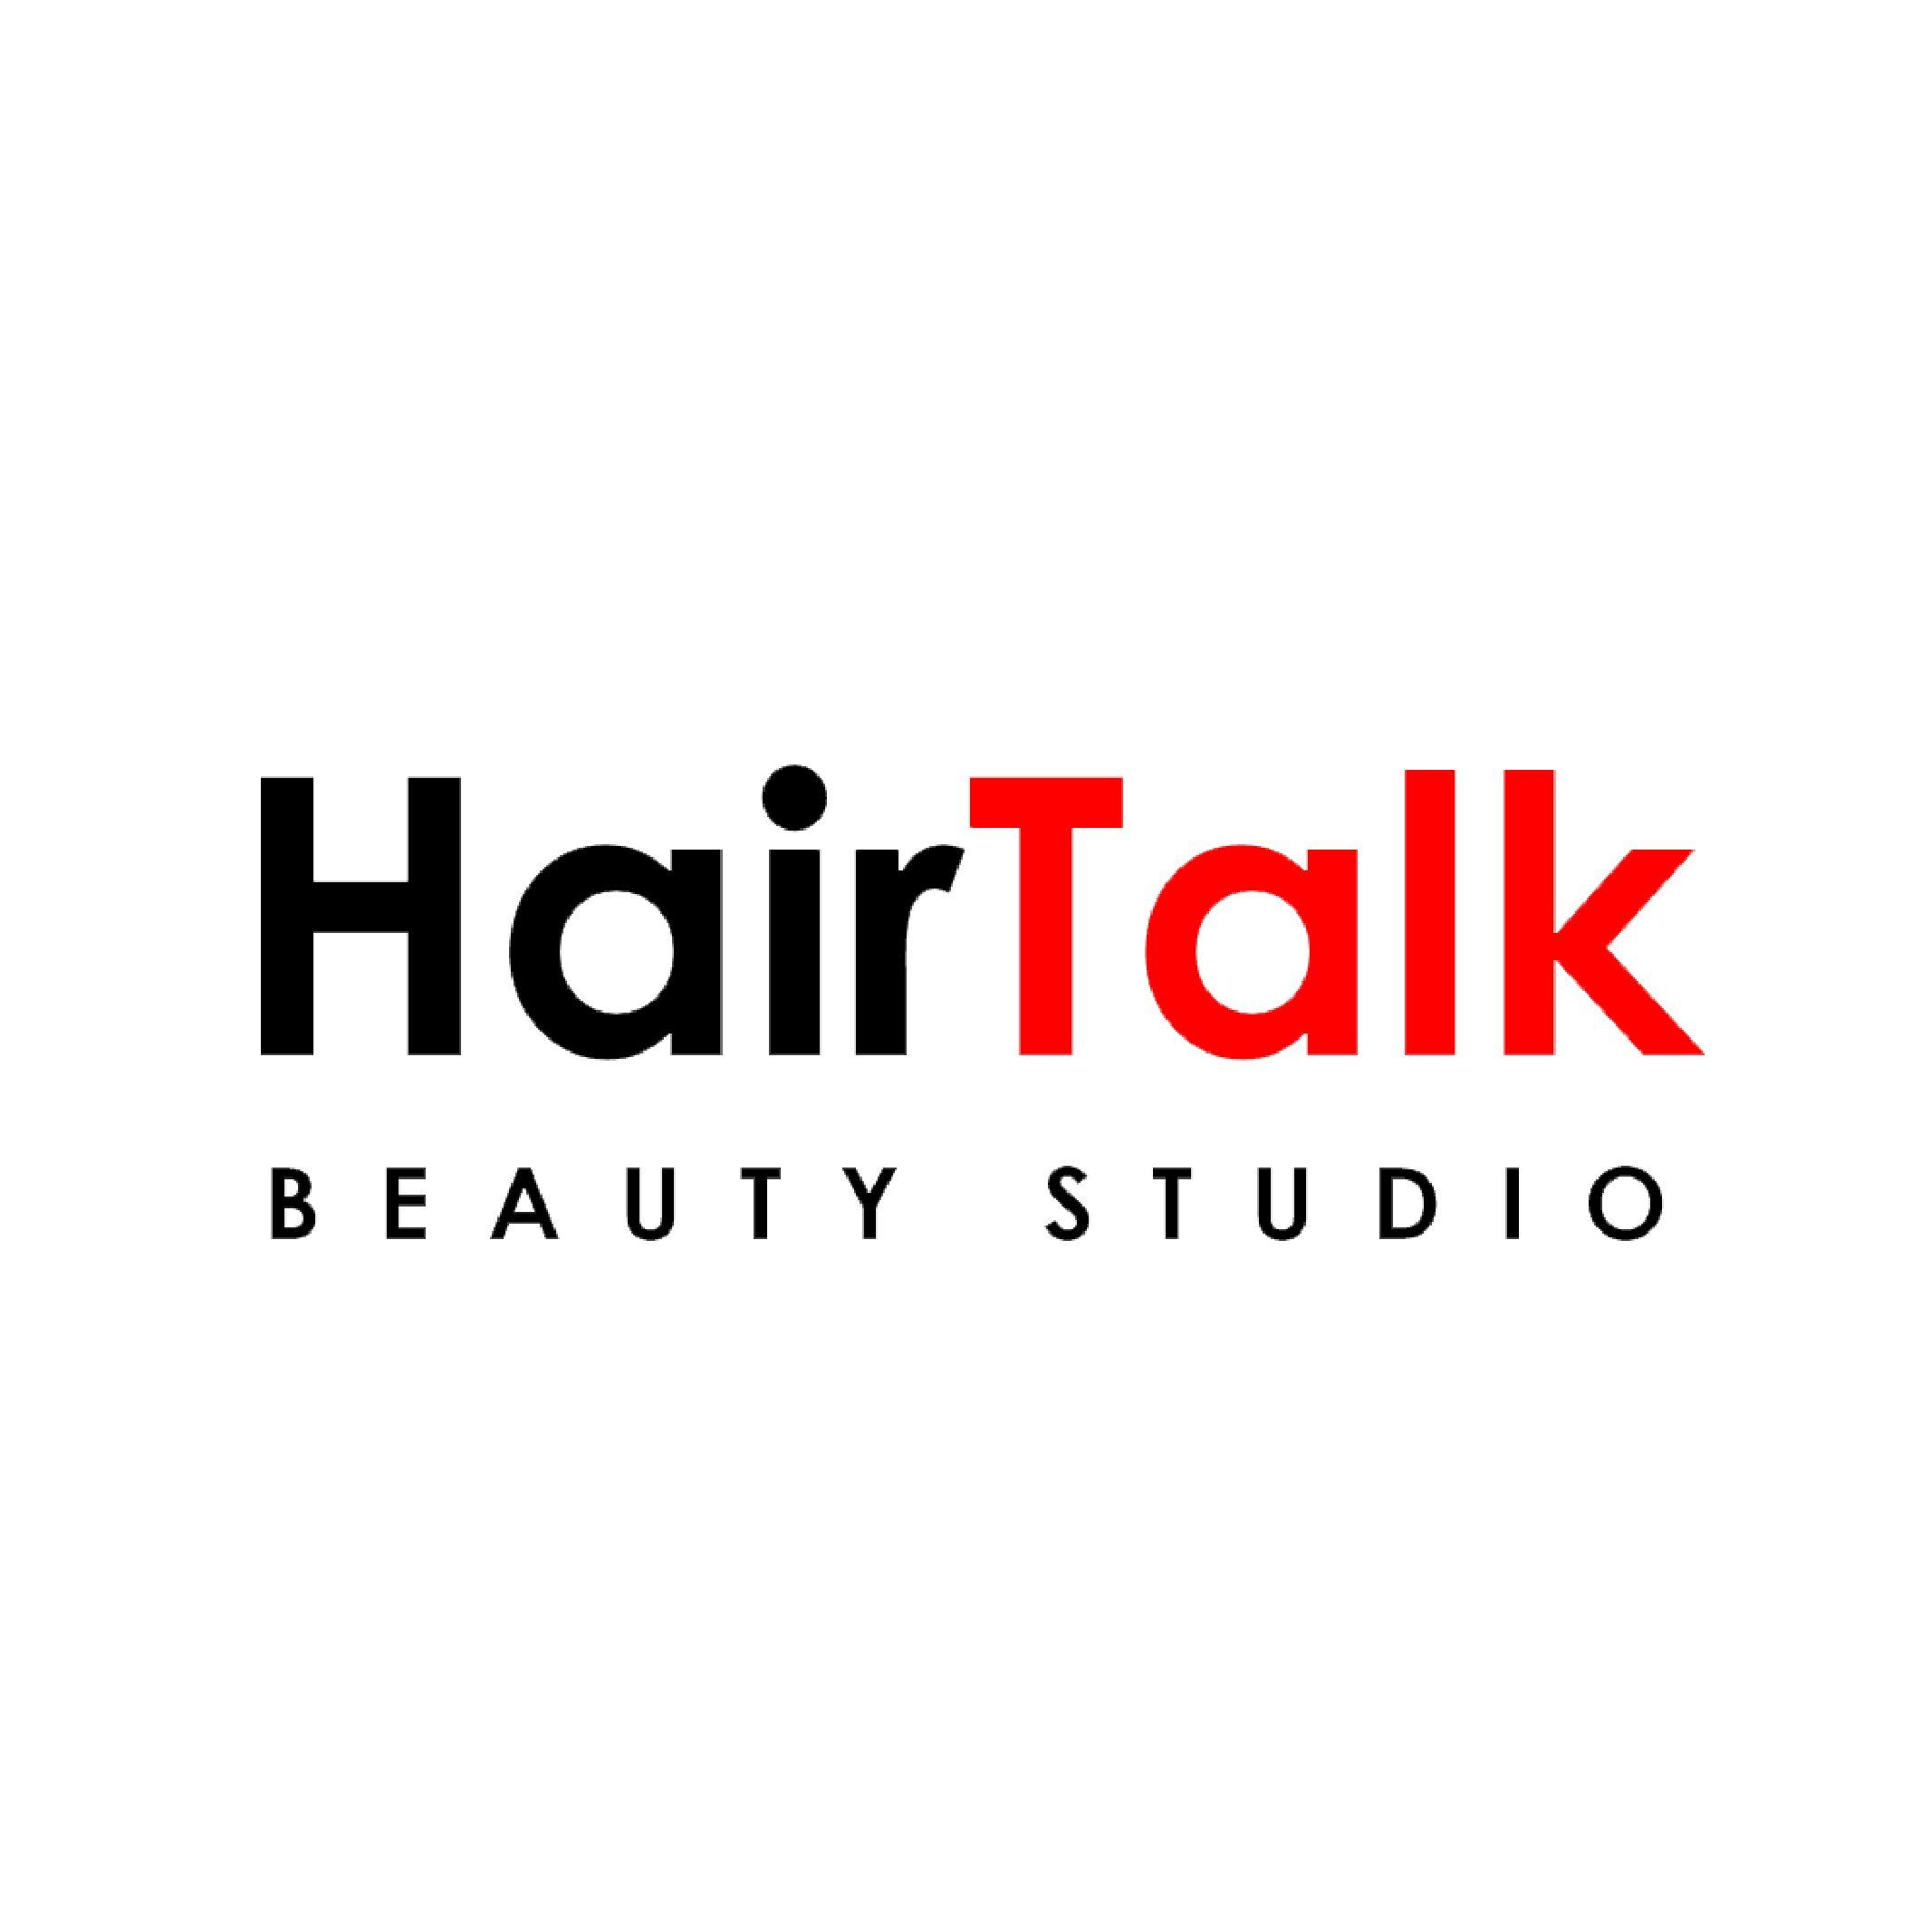 Hair Talk Beauty Studio